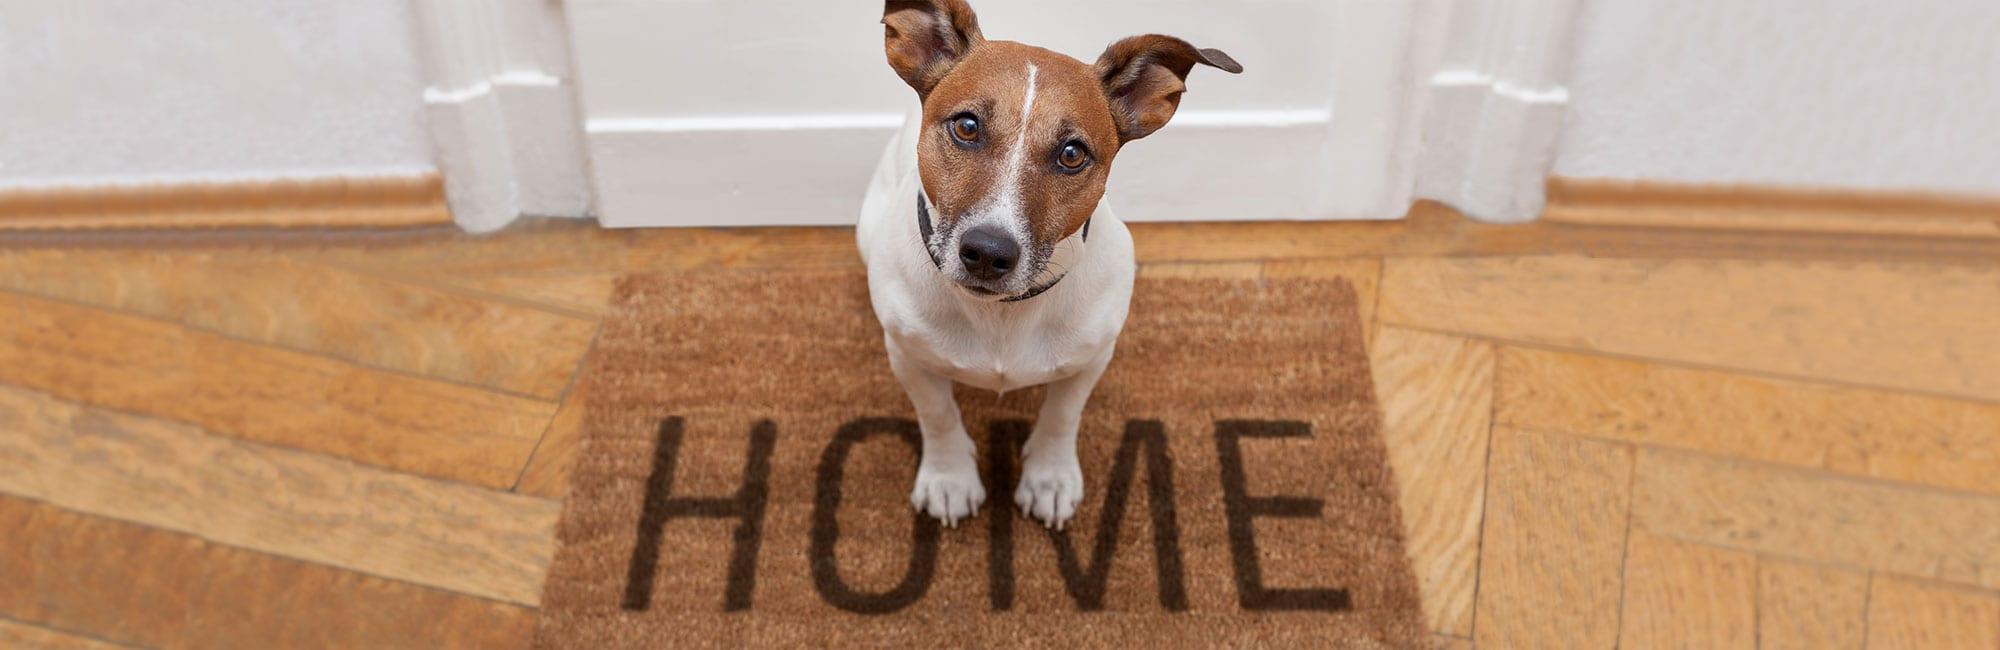 dog-home